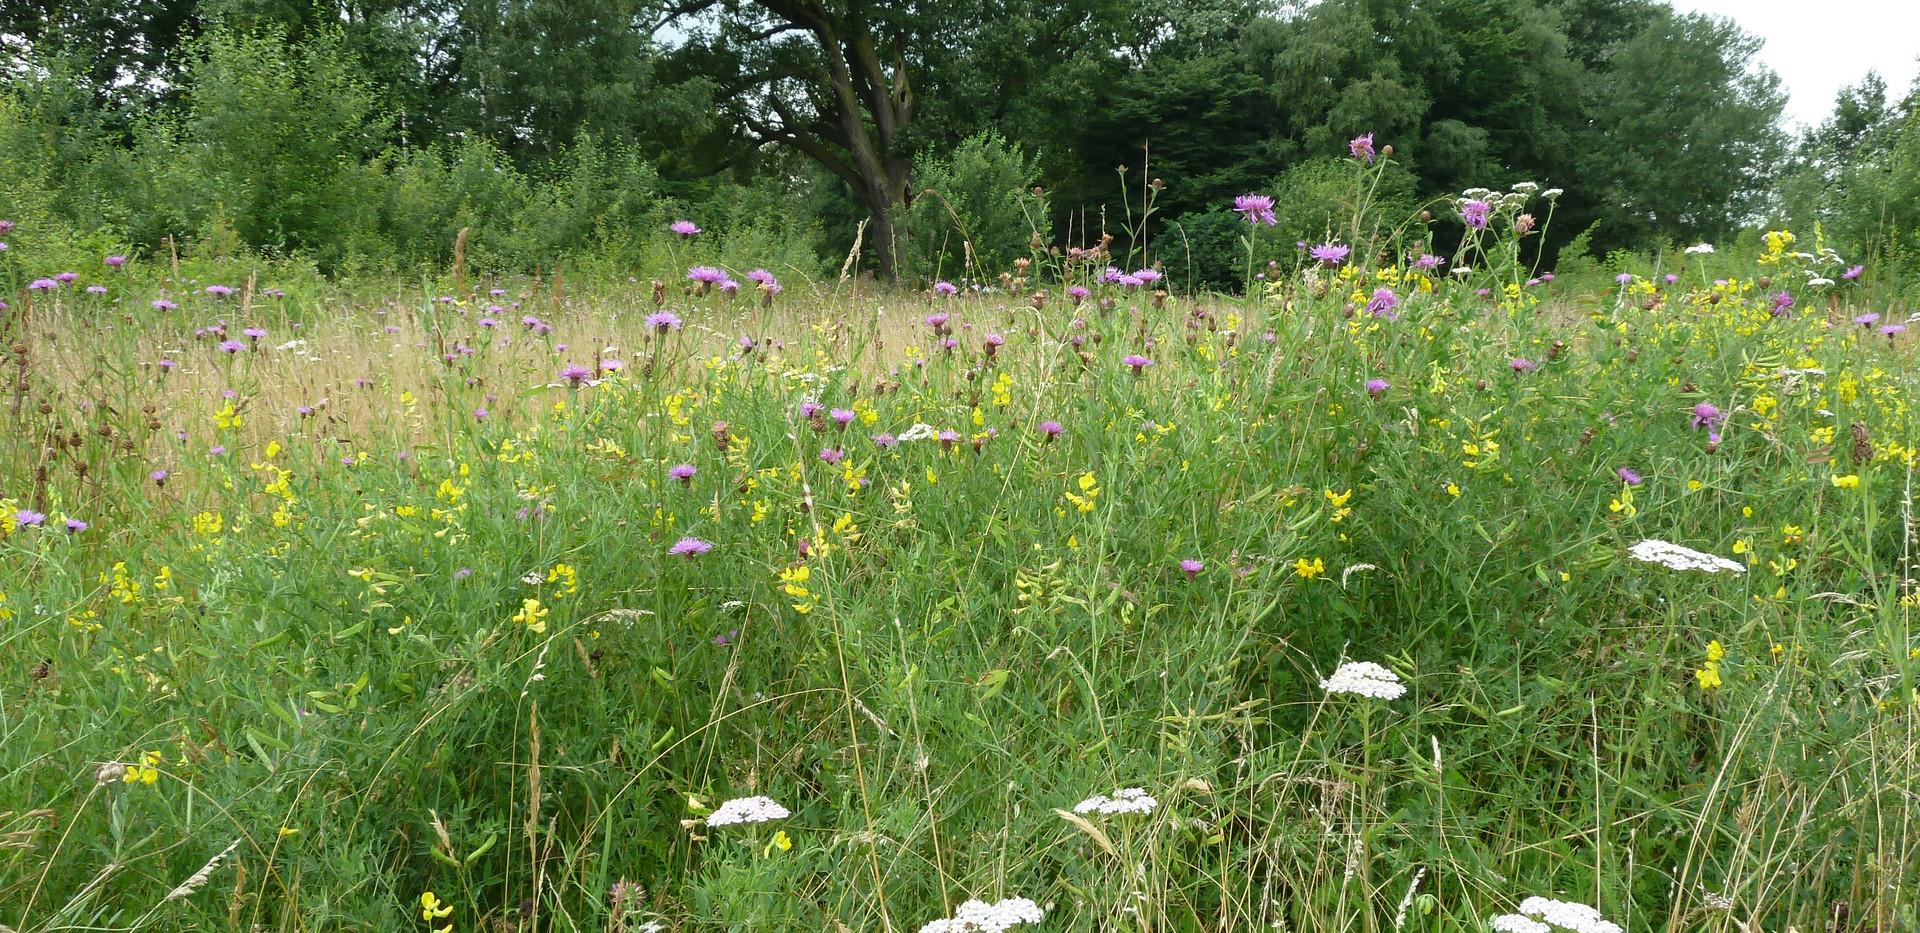 Mengsel 2 - Kruidenrijke gemengde grasstrook